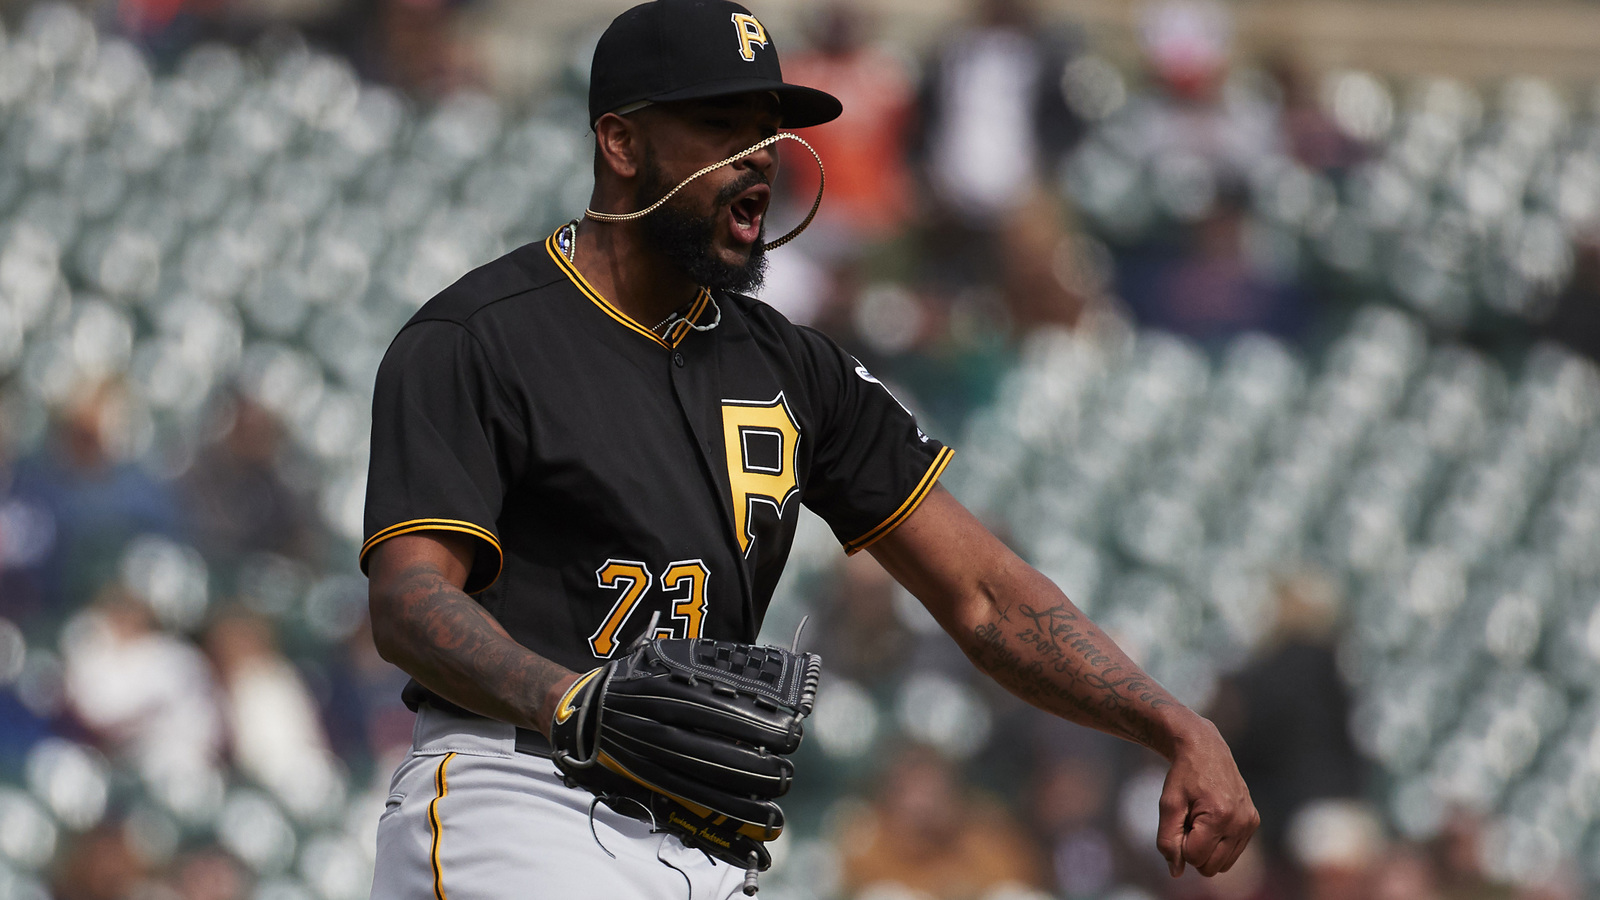 Pirates reliever Felipe Rivero changes name to Felipe ... Felipe Vazquez